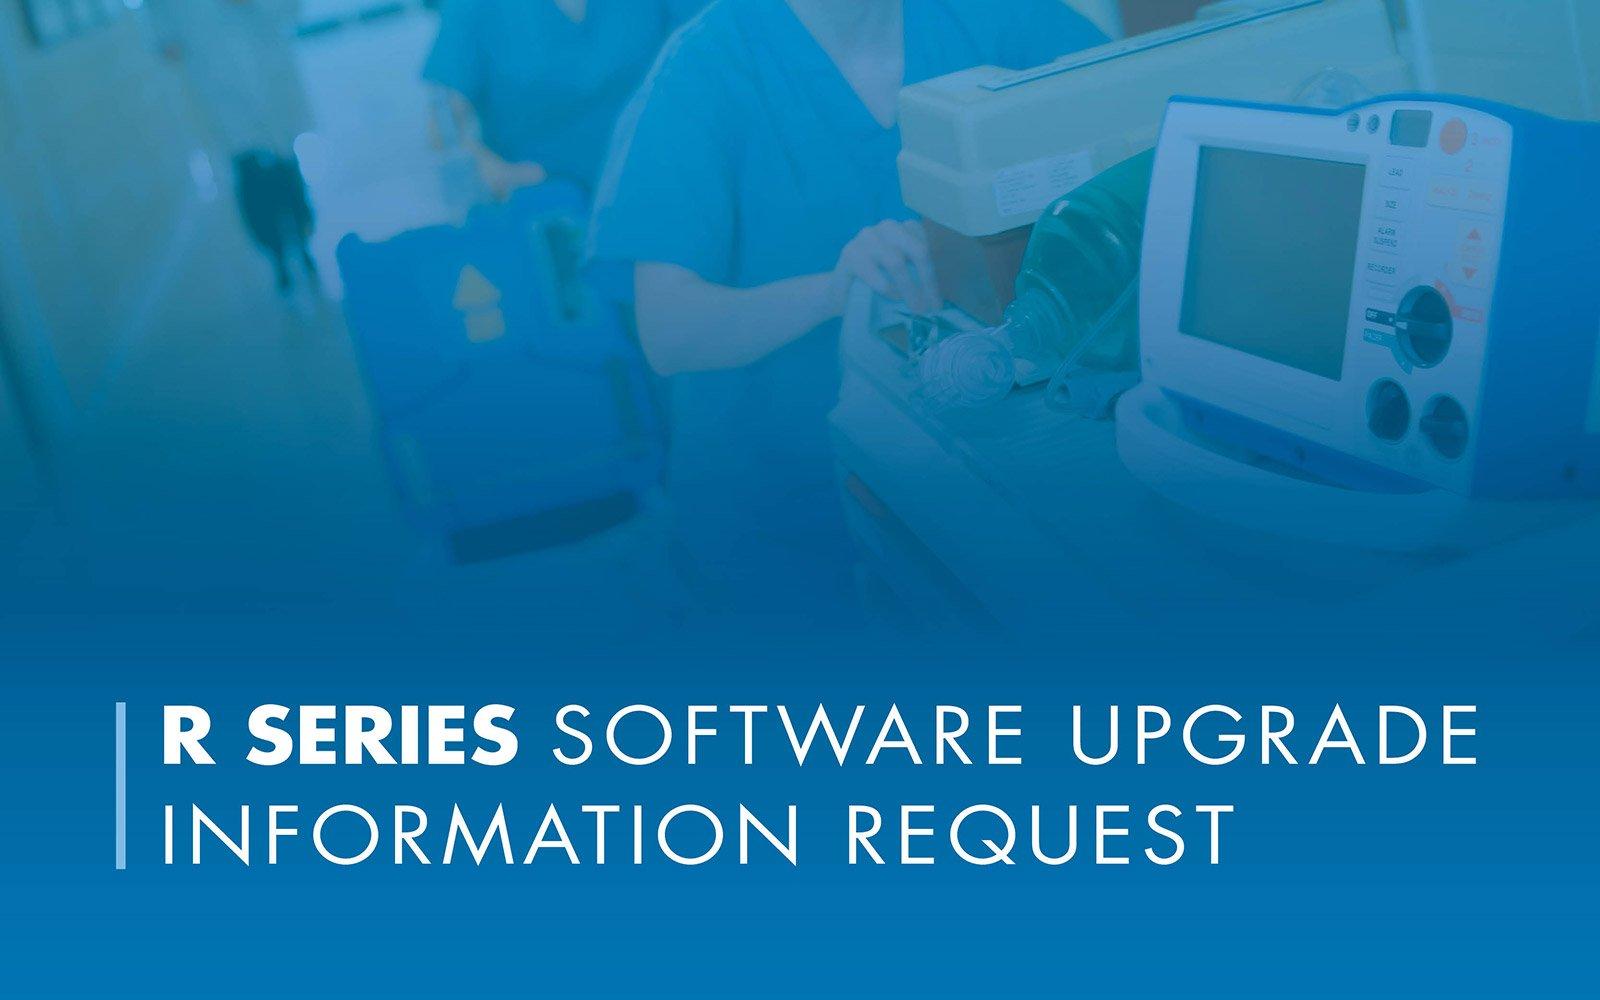 H-HSoftwareQ417_RSeries_Software_Update_Mobile.jpg